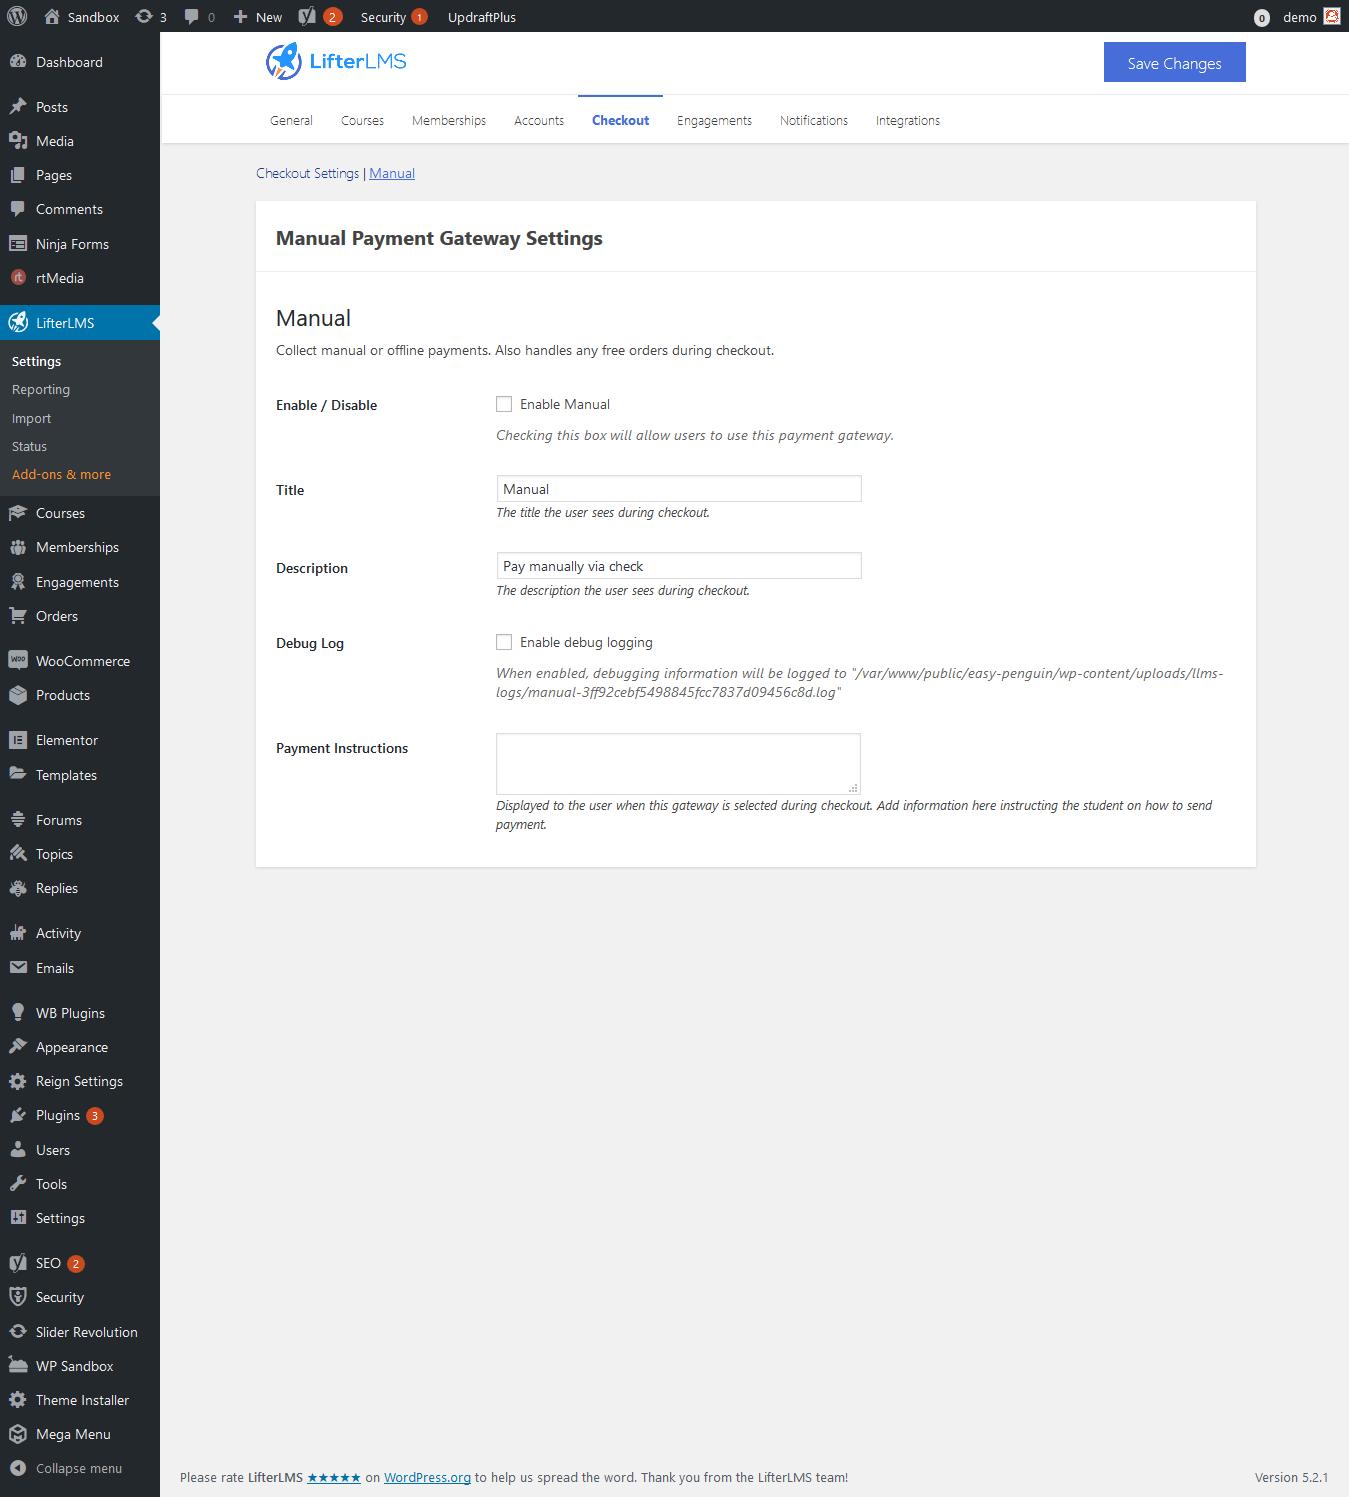 Screenshot 2019 06 15 LifterLMS Settings ‹ Sandbox — WordPress3 - Wbcom Designs